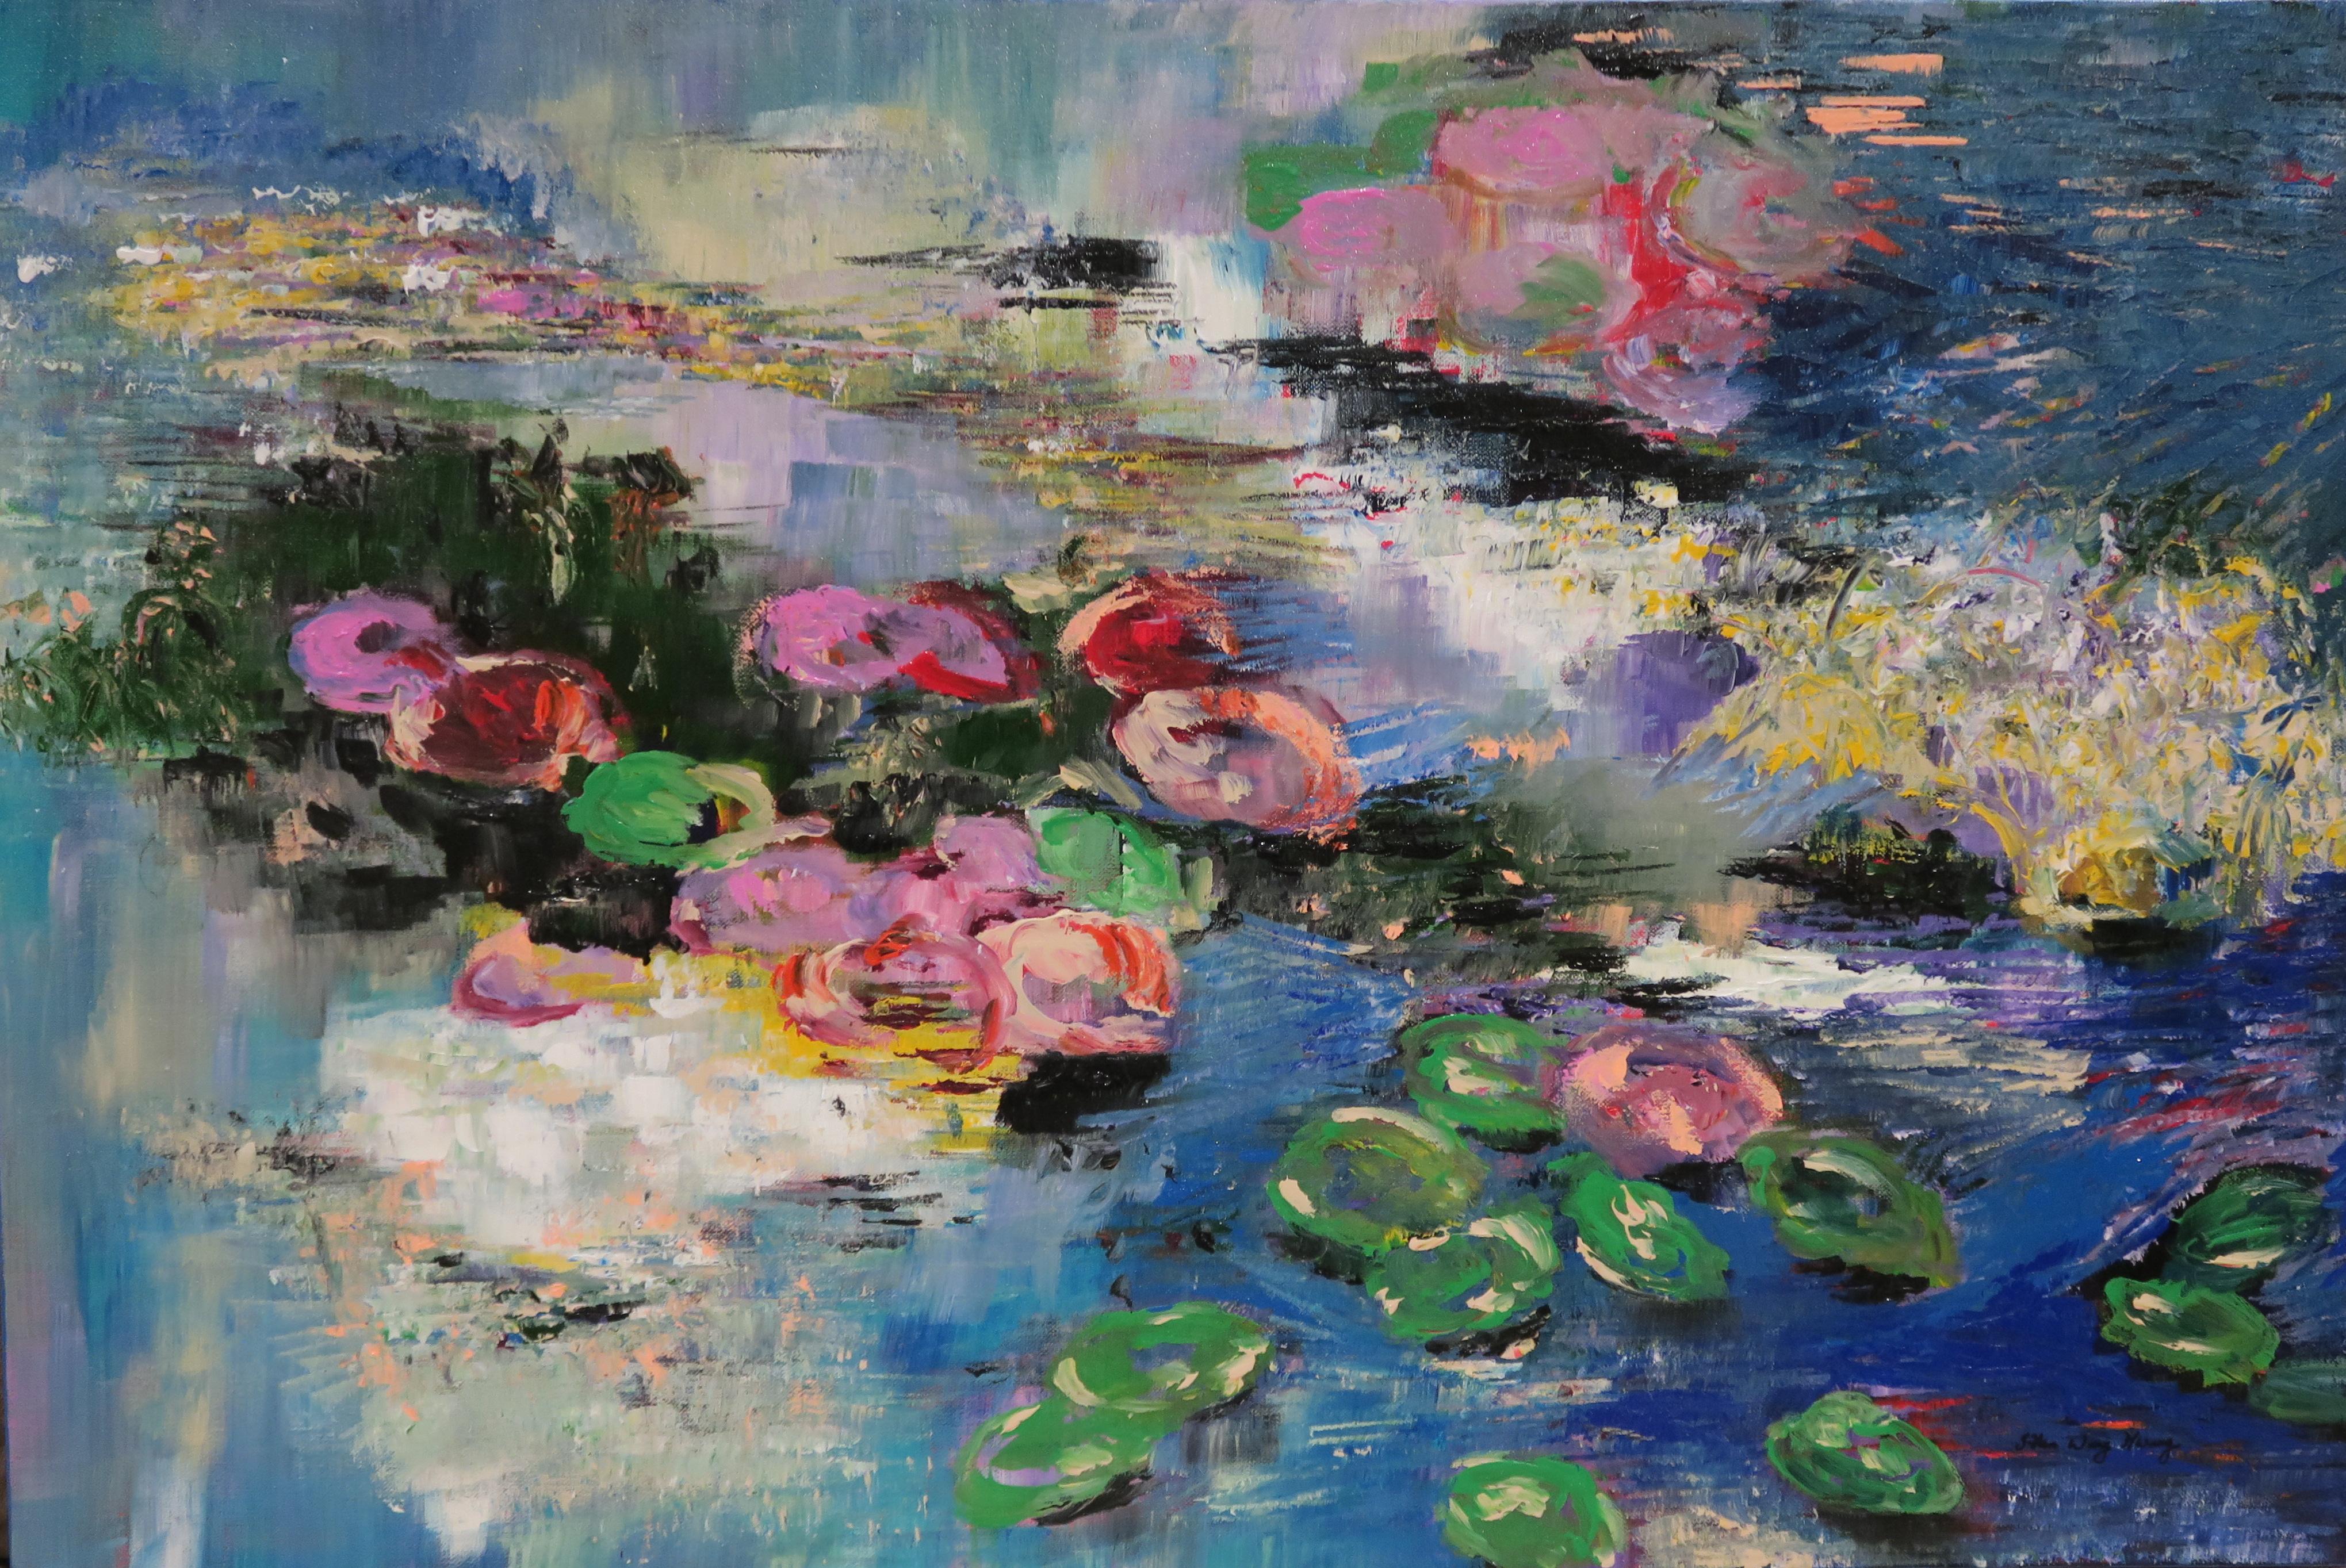 Lily Pond (2016) 36 x 24